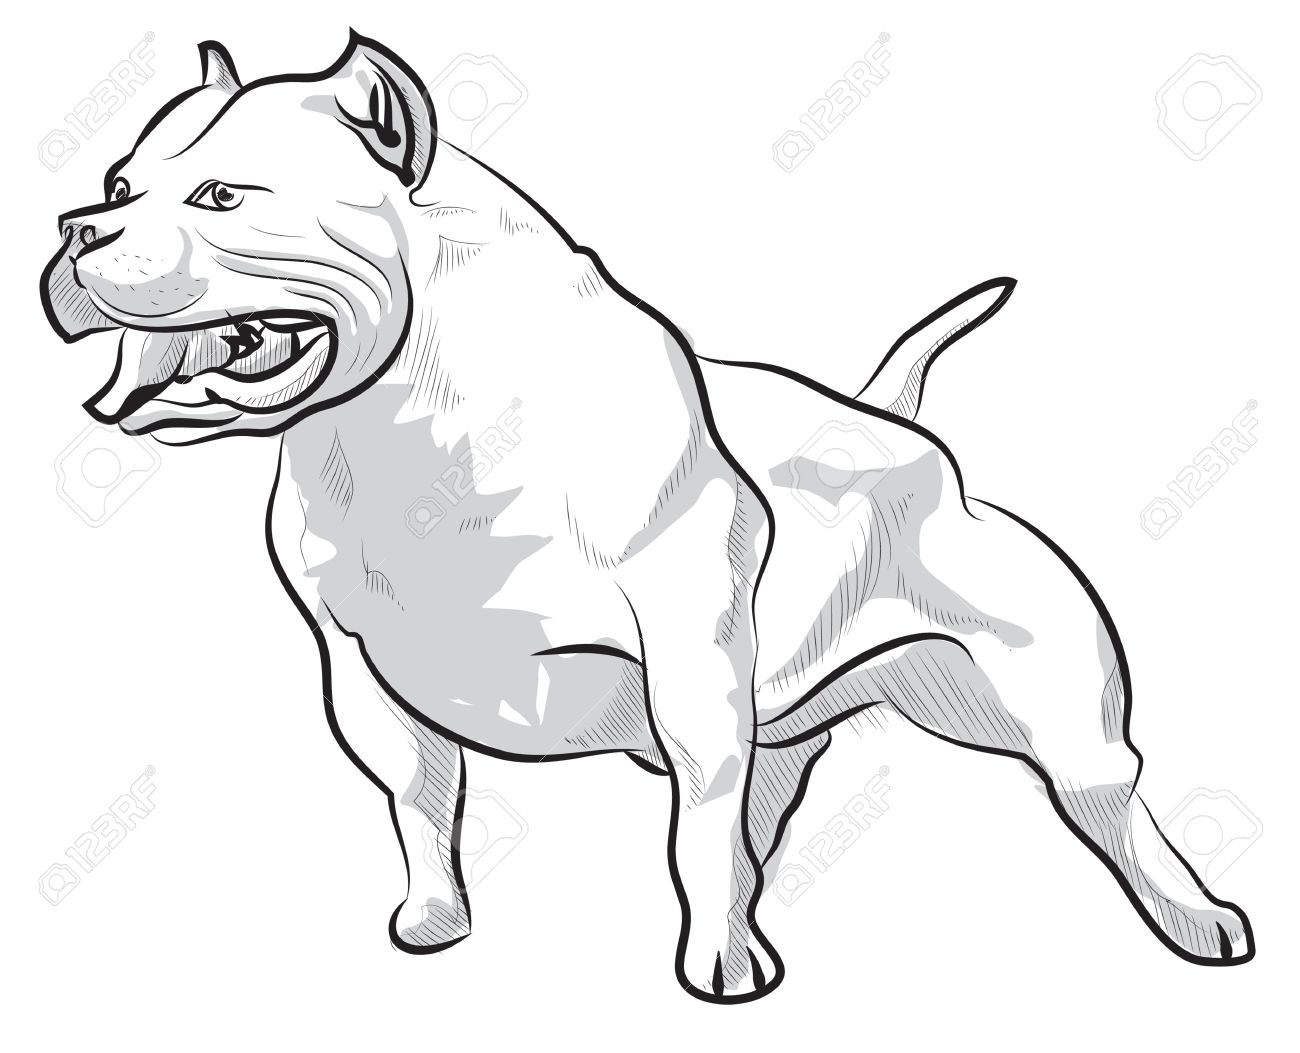 1300x1053 Vector Sketch Hand Drawing Illustration Pitbull Barking Royalty